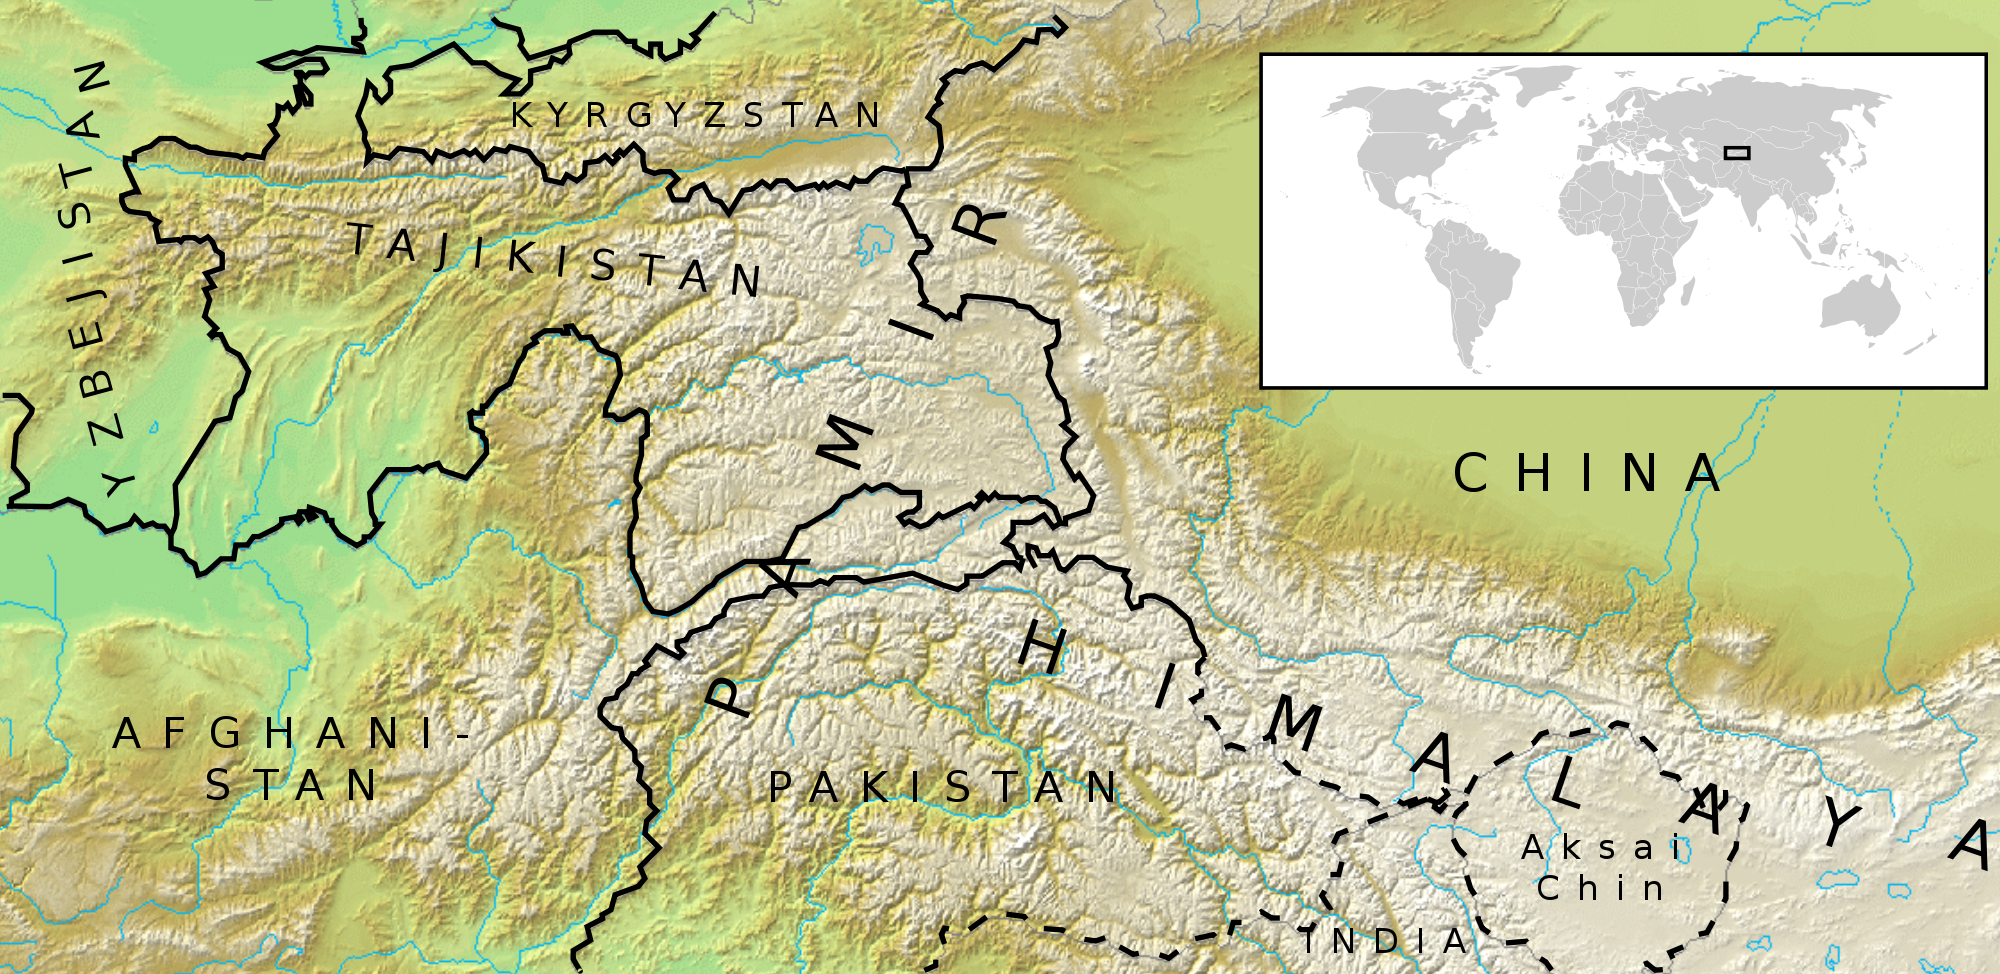 map of the Hindu kush region Google zoeken Stan de Paki Pinterest Ce